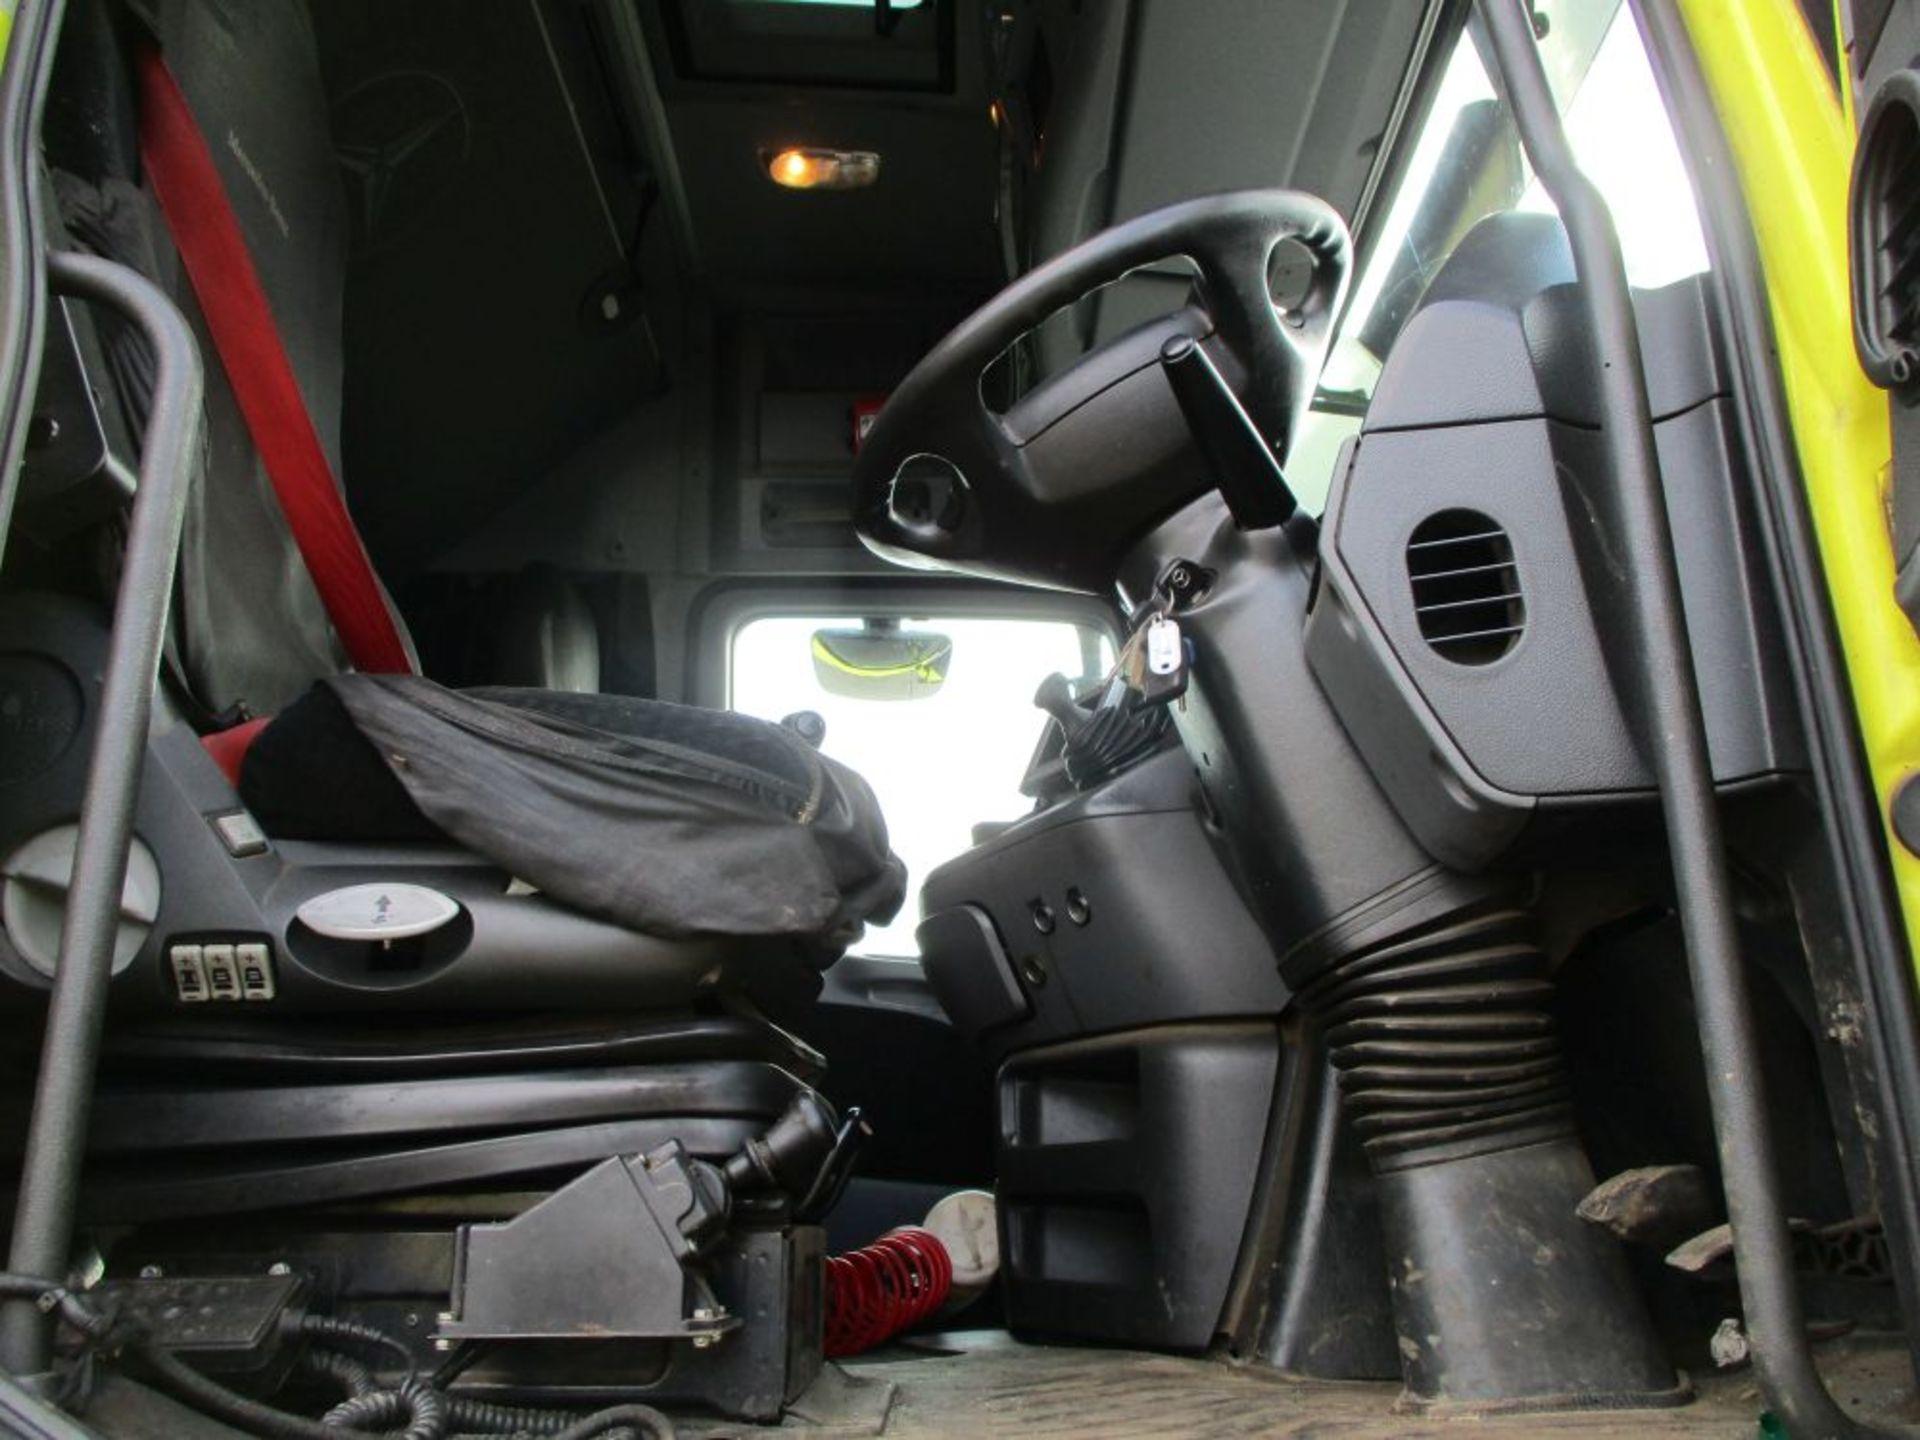 Lot 44 - Mercedes 2455 Actros V8 6x2 Midlift Unit